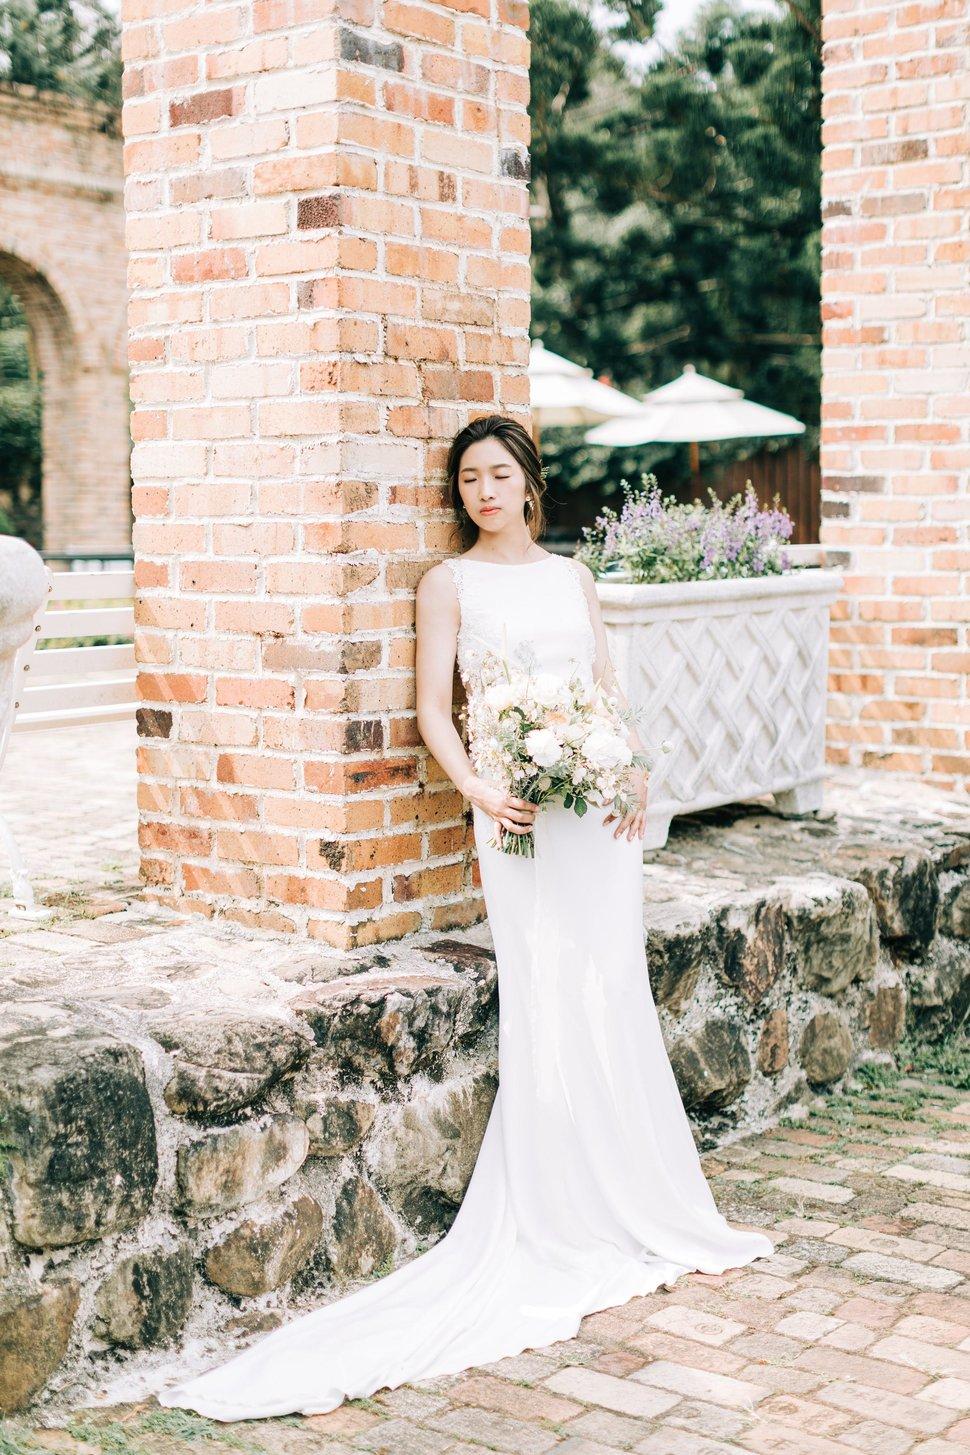 AG3_6580A - Cradle Wedding搖籃手工婚紗《結婚吧》